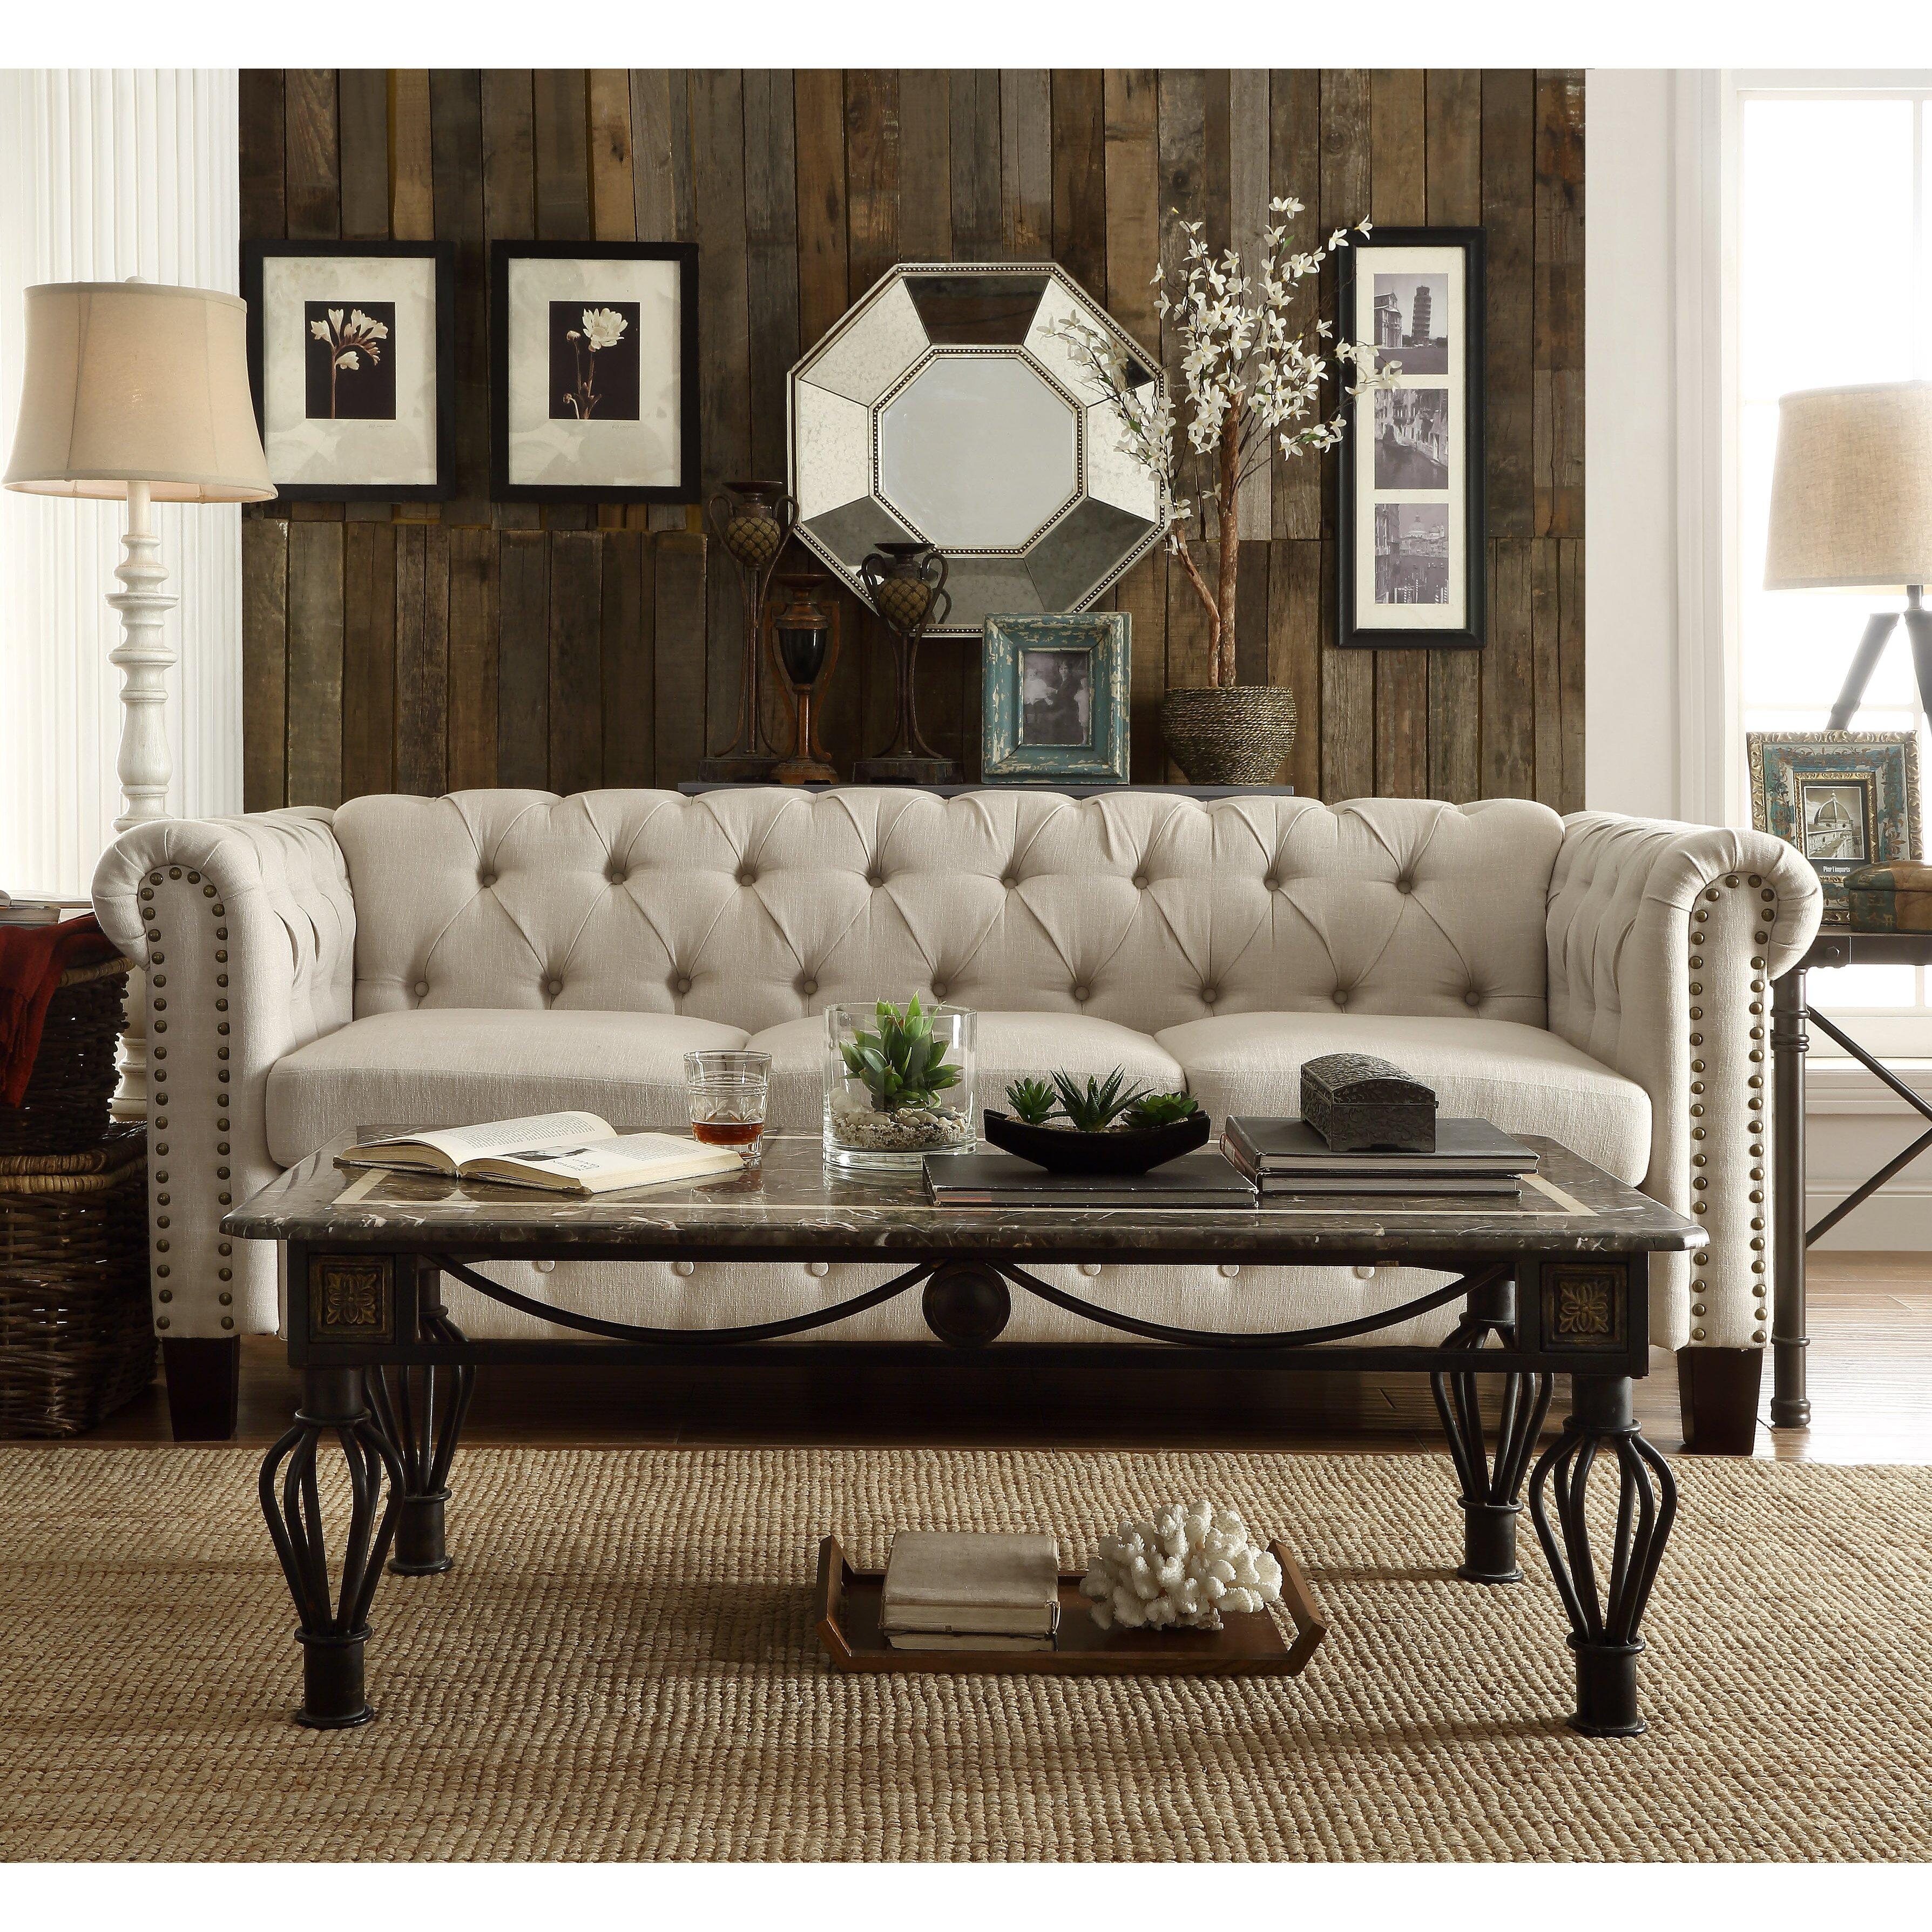 Laurel foundry modern farmhouse adeline chesterfield sofa for Amerikanische sofas